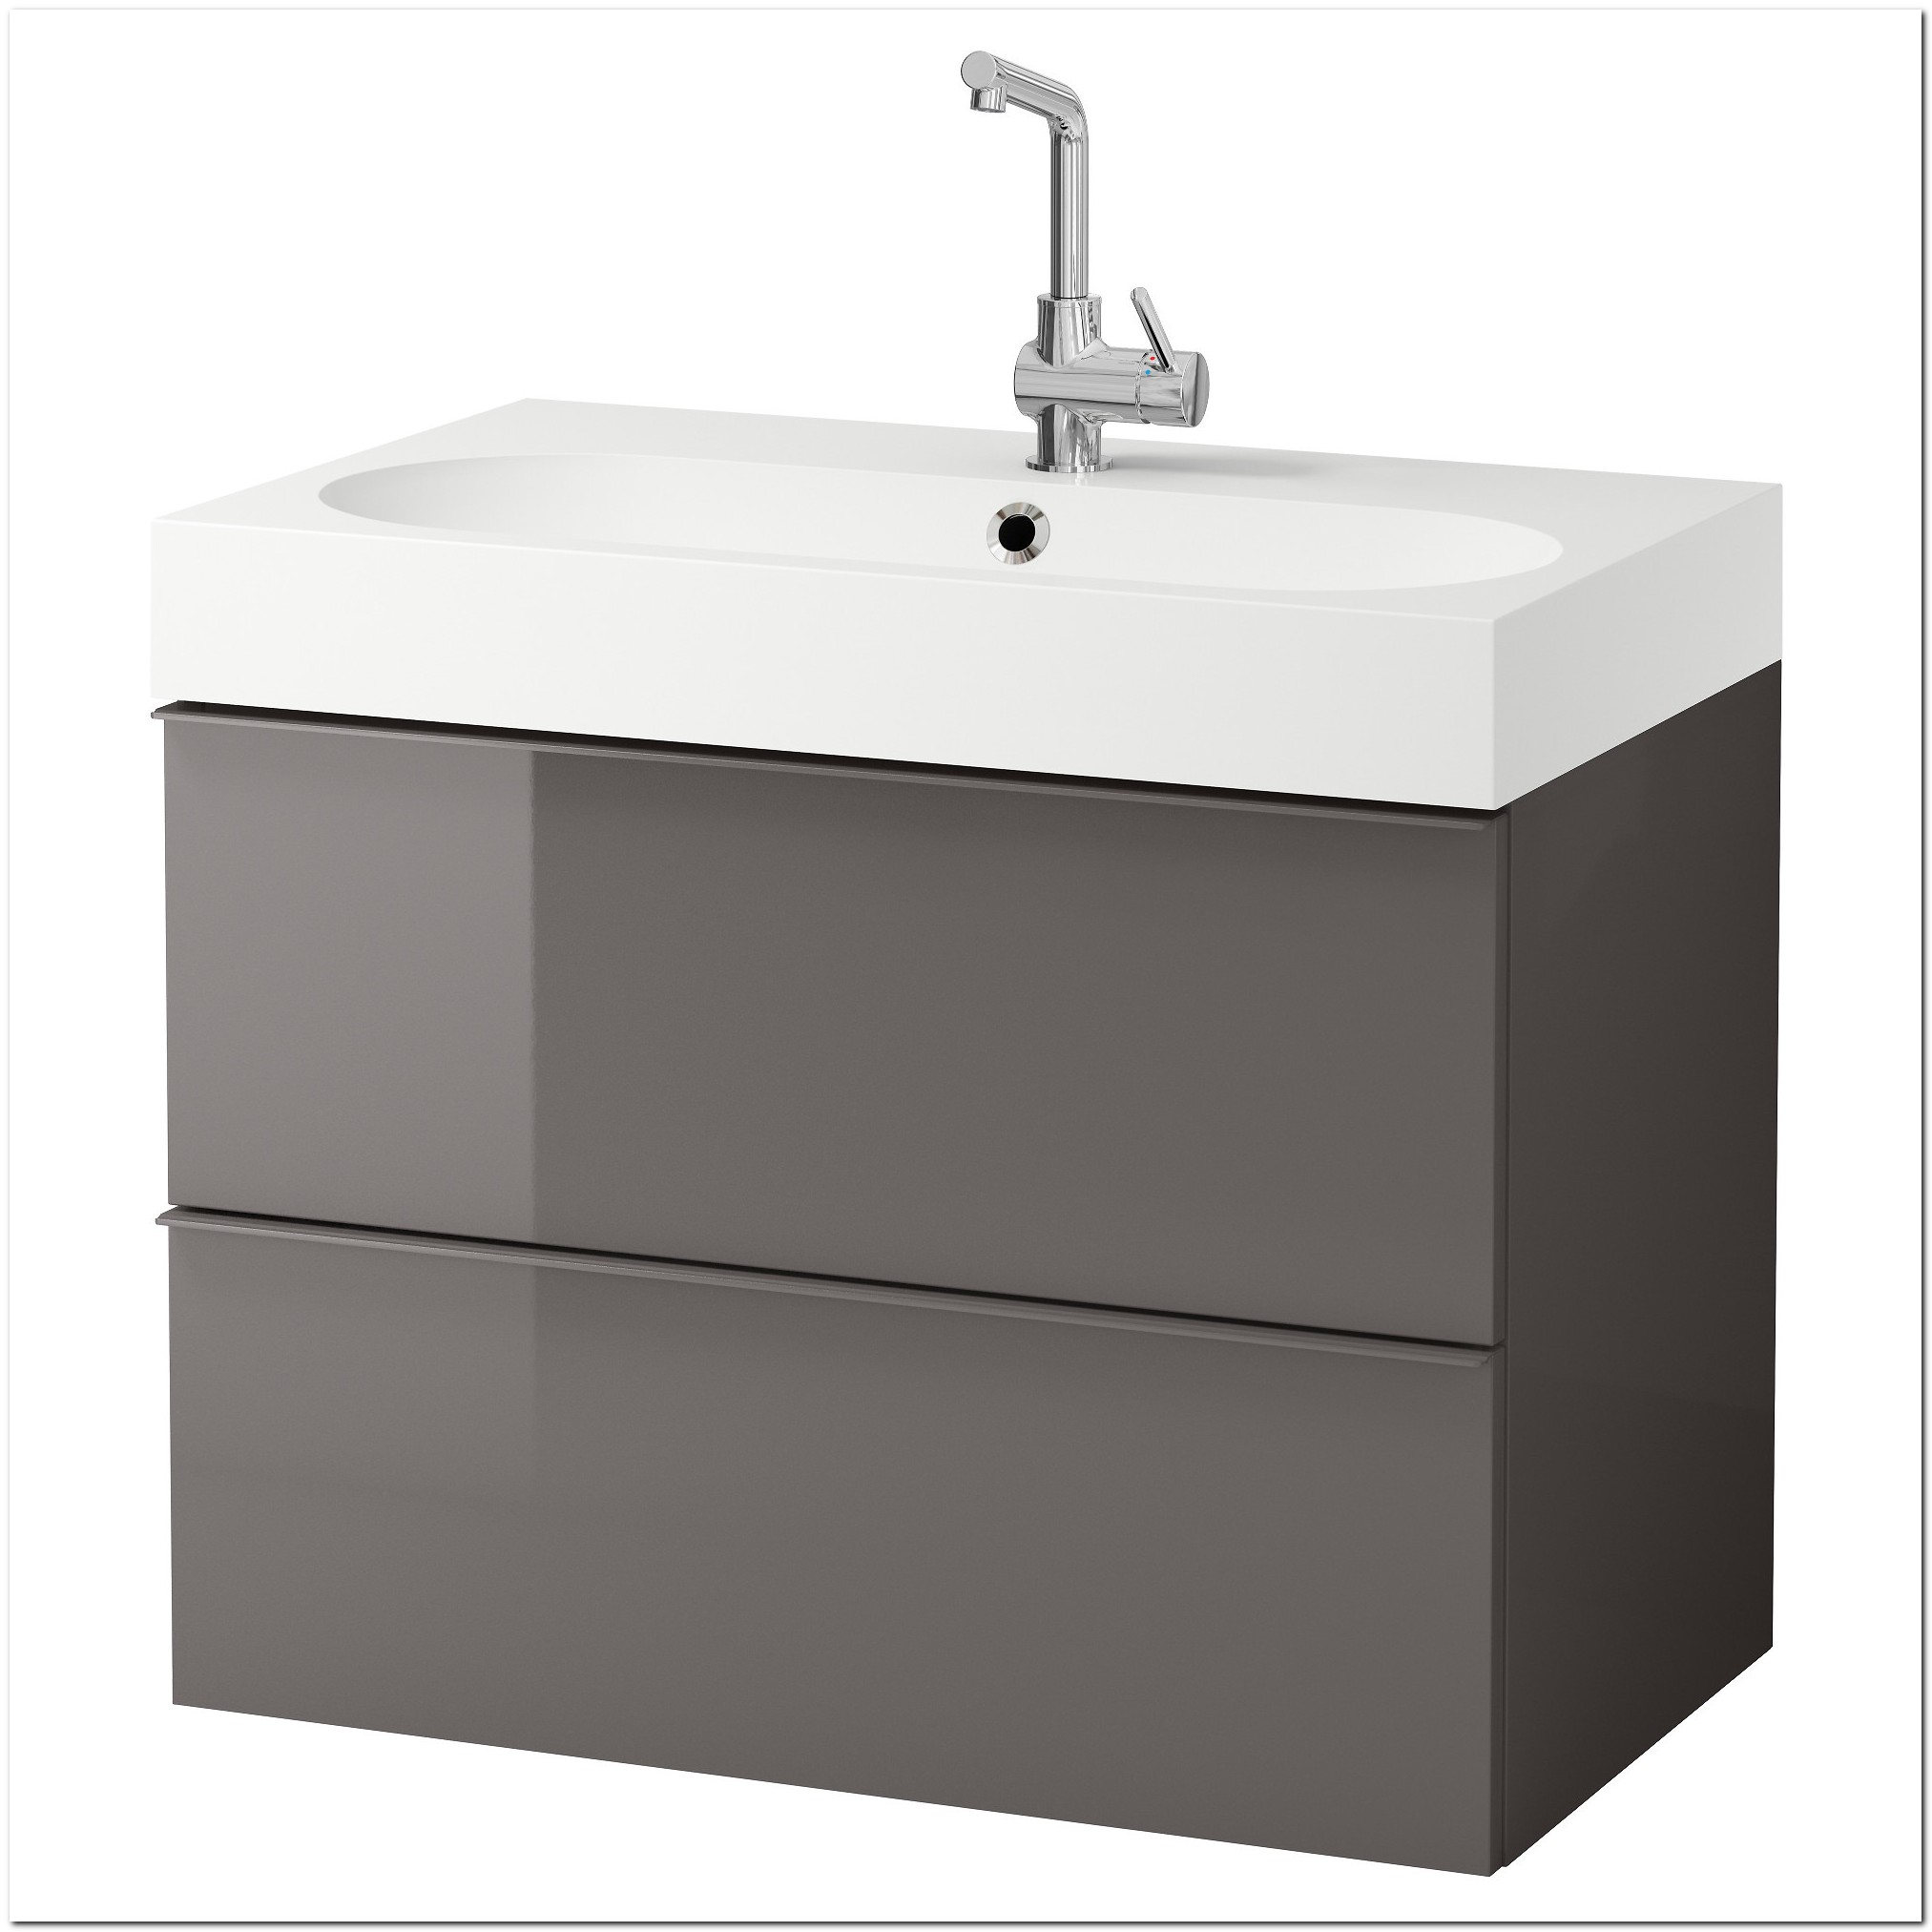 Bathroom Sink Cabinets Ikea Uk